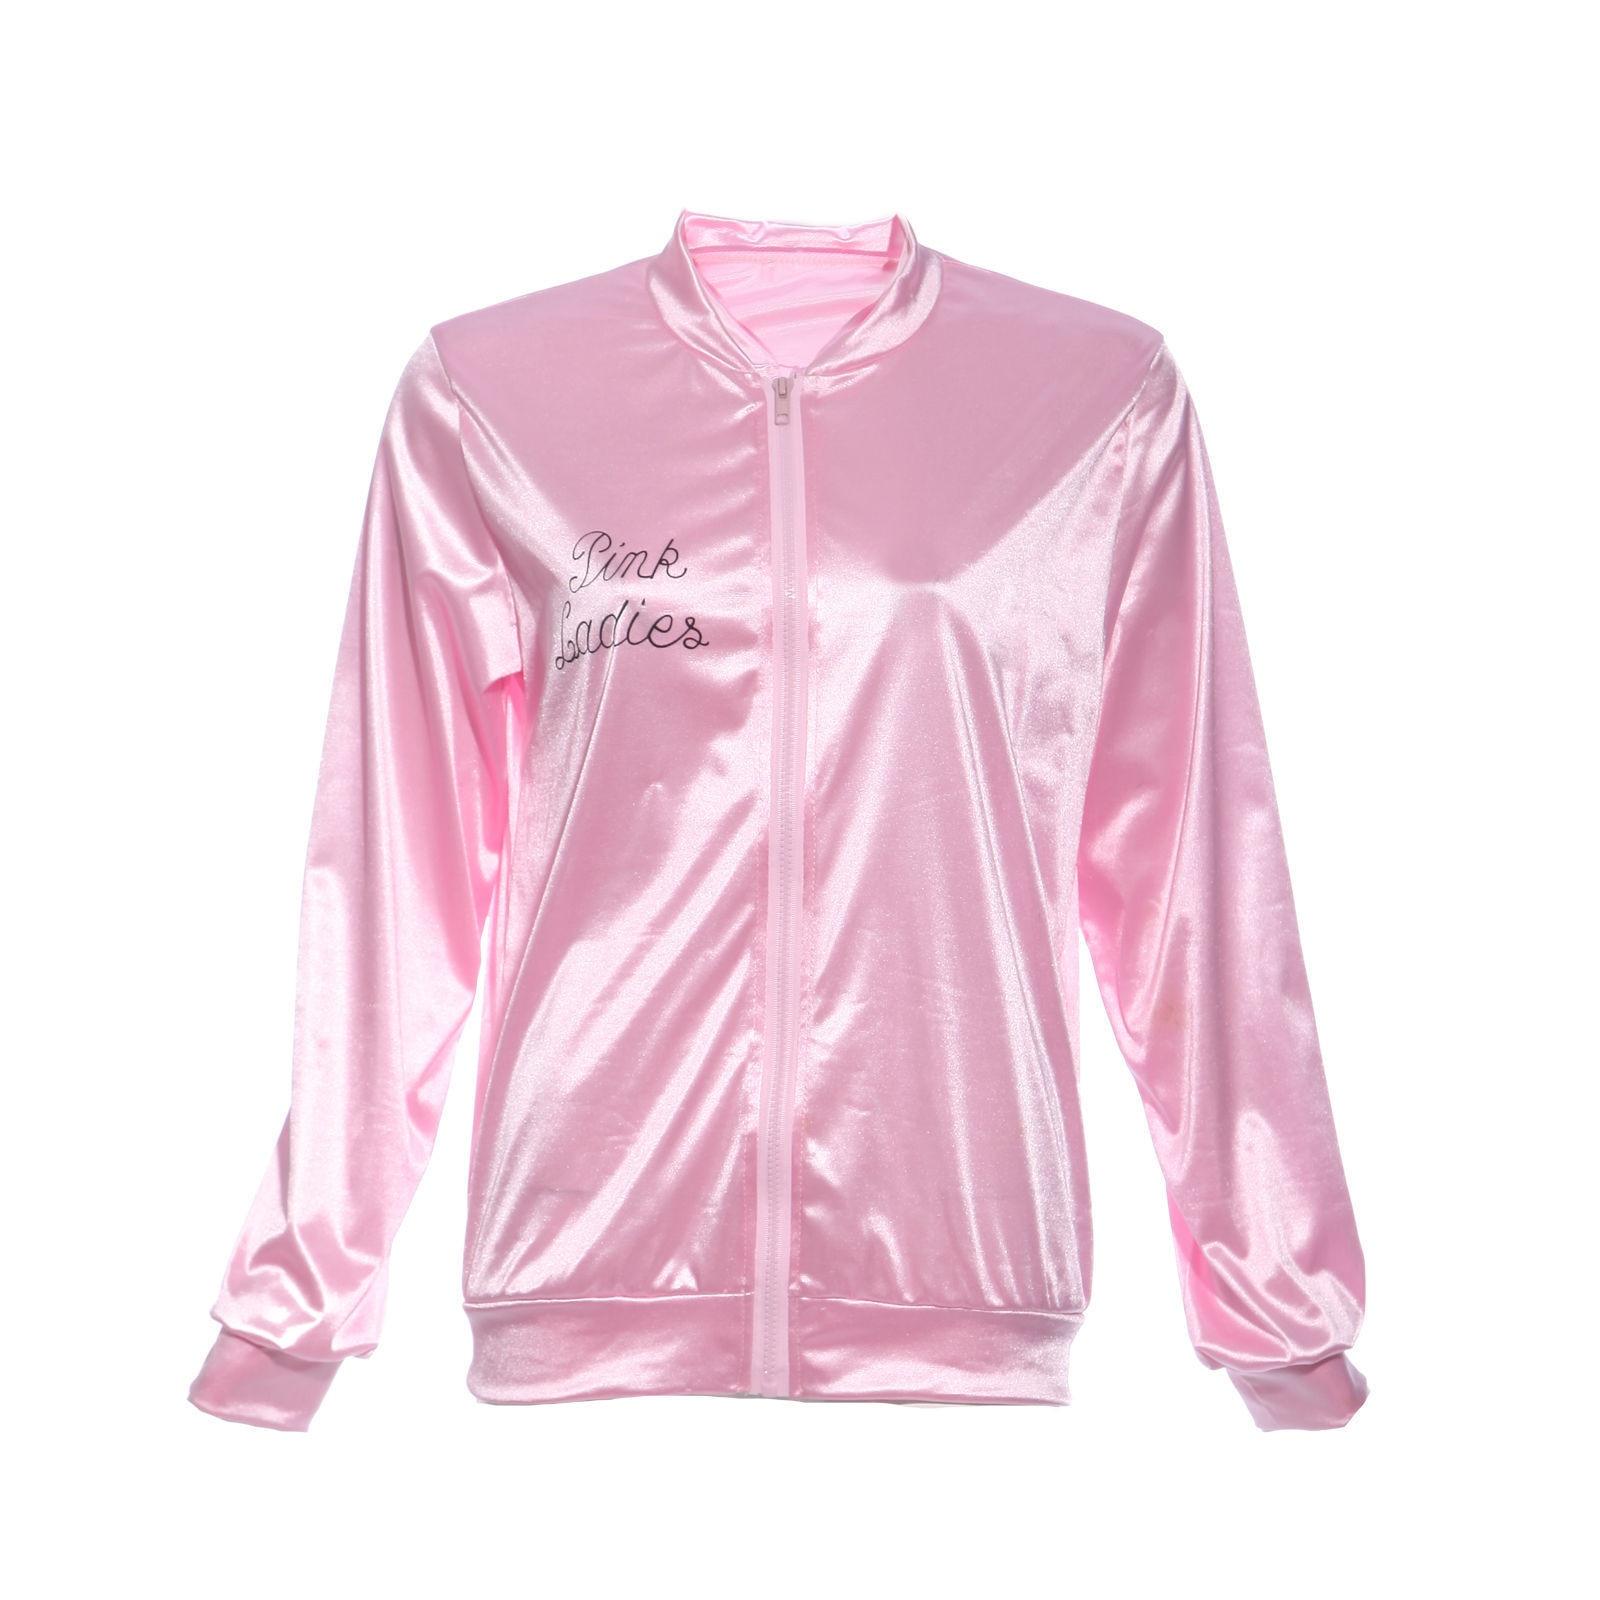 2017 New Halloween Pink Hoodies Lady Retro Jacket Womens Fancy ...